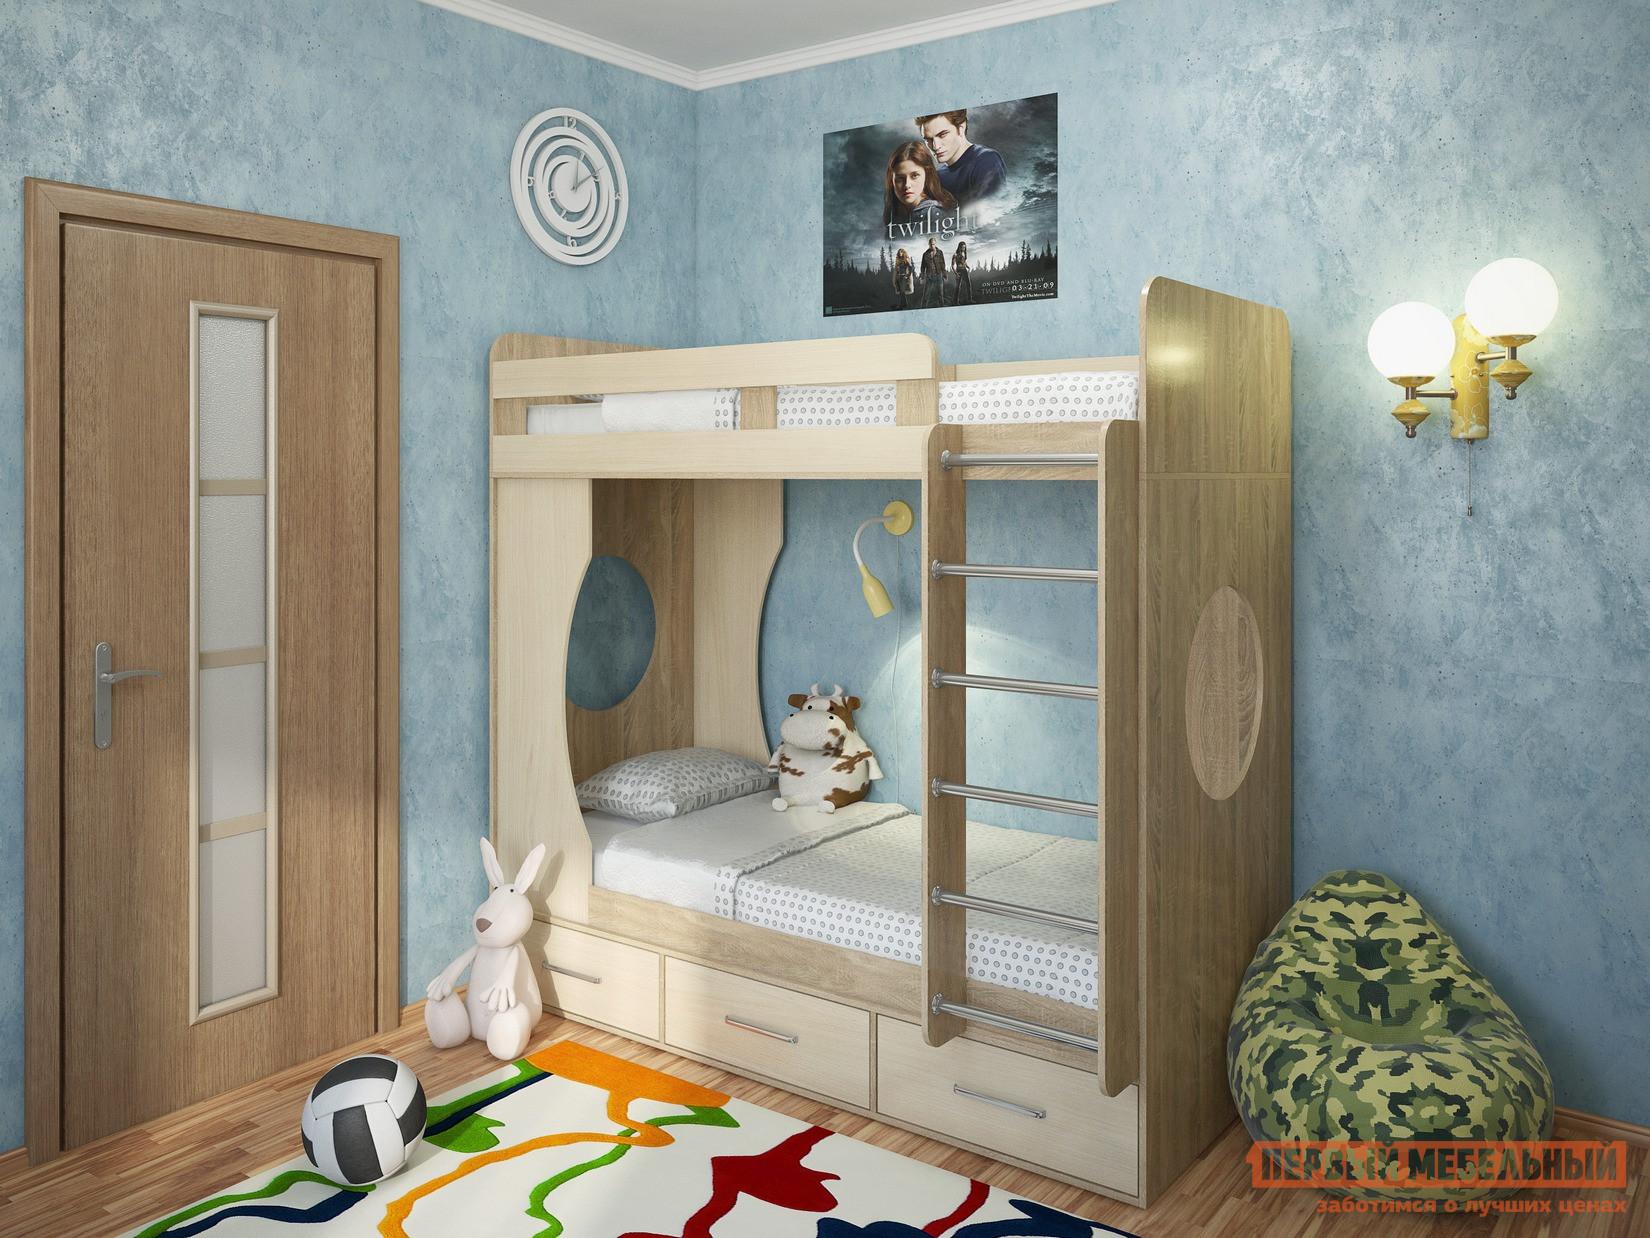 Двухъярусная кровать Милана Милана-1 Сонома двухъярусная кровать милсон милана duo 200 х 80 см красная